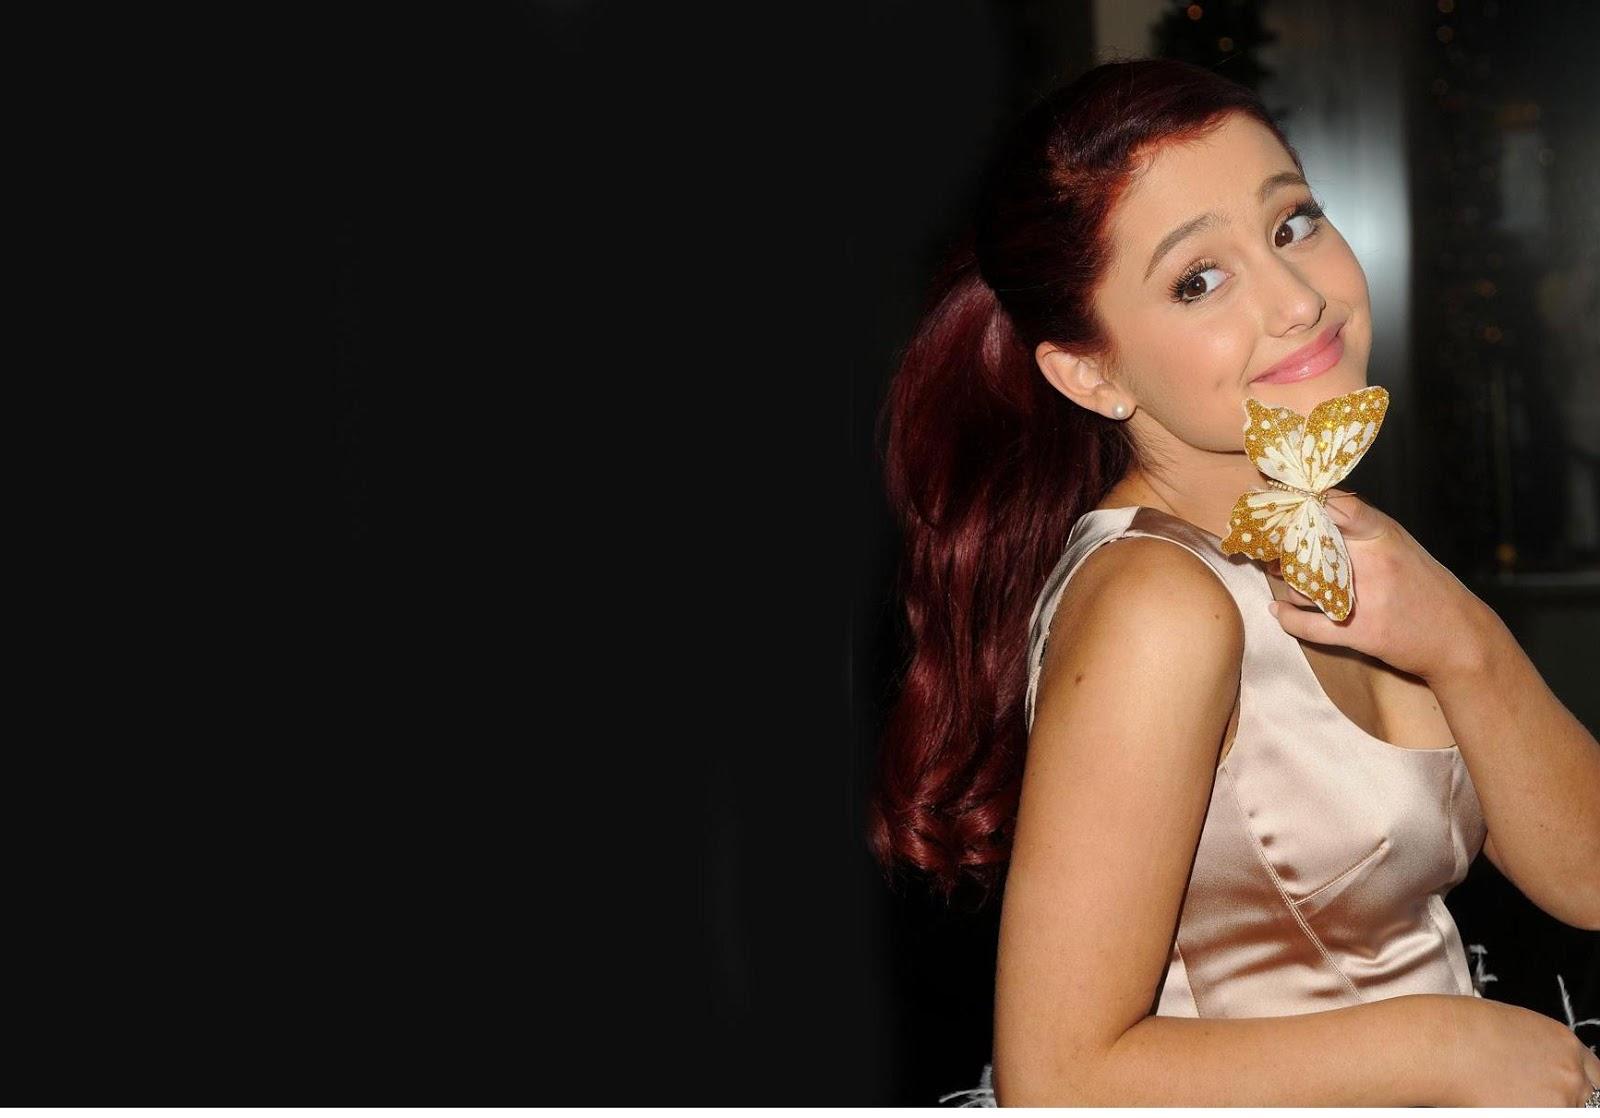 Ariana Grande Wallpaper Free Download